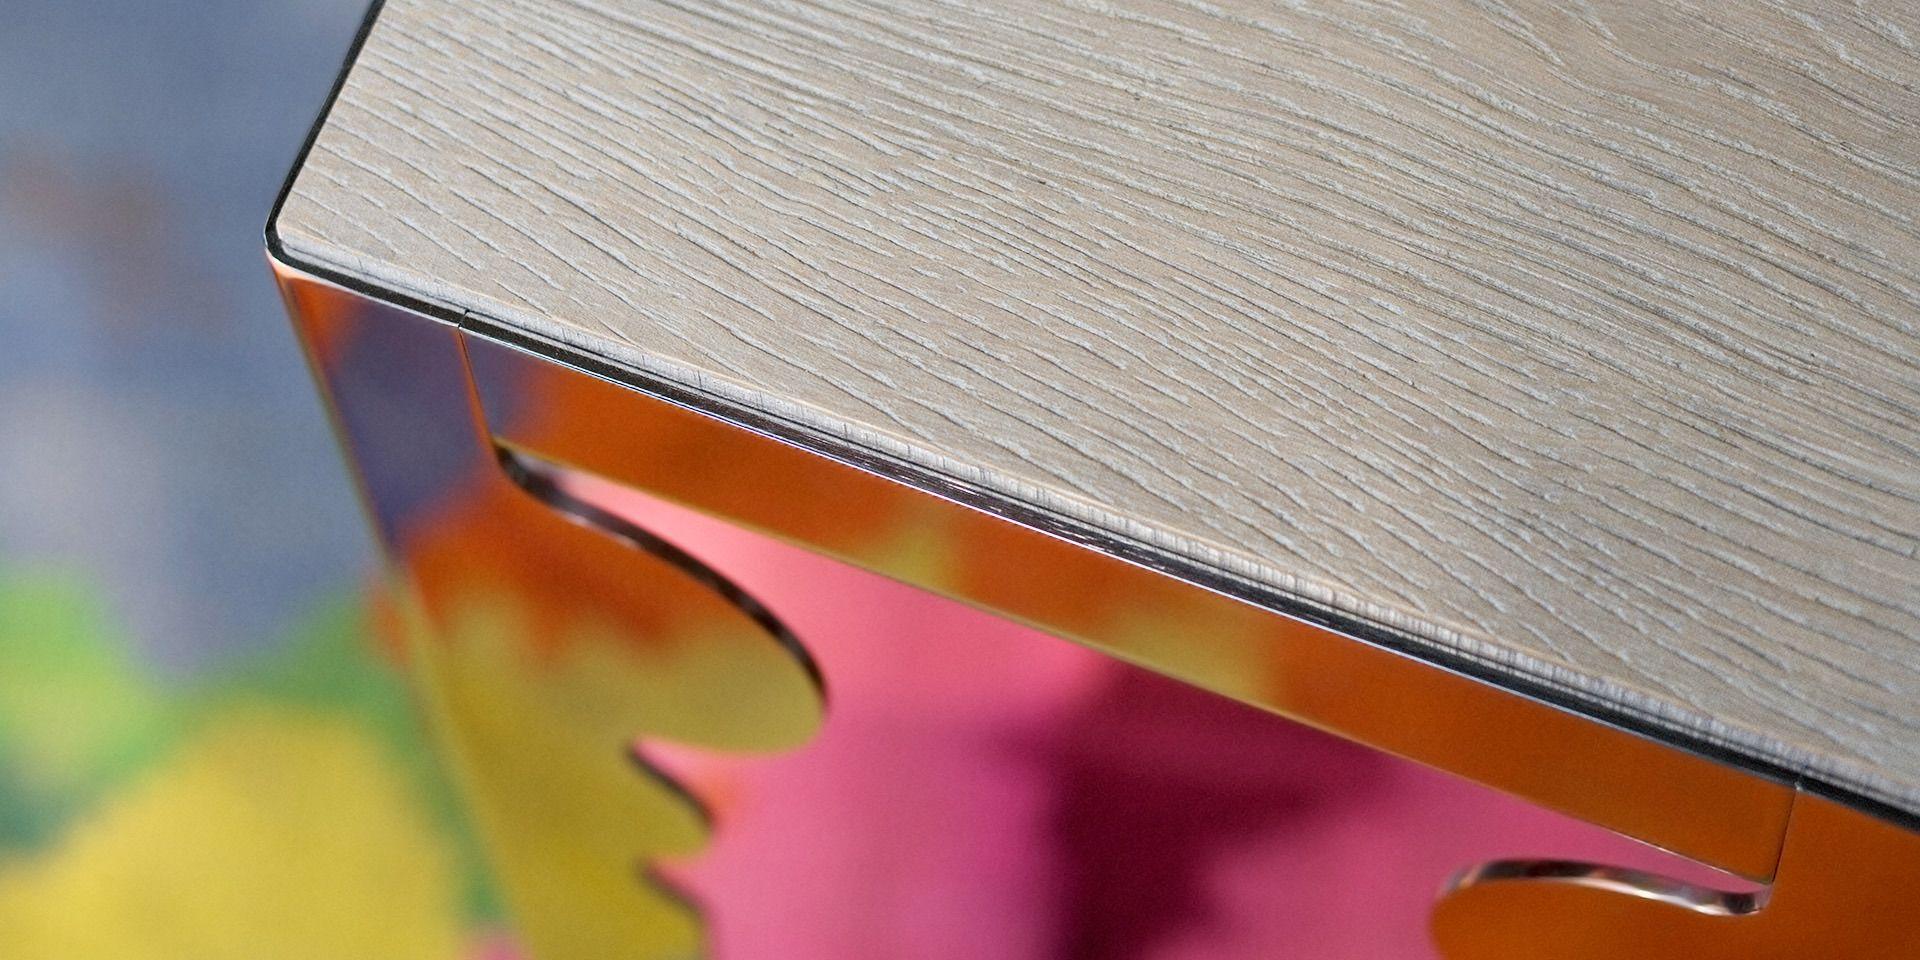 Tavolino in acciaio lucido di Lando | lartdevivre - arredamento online